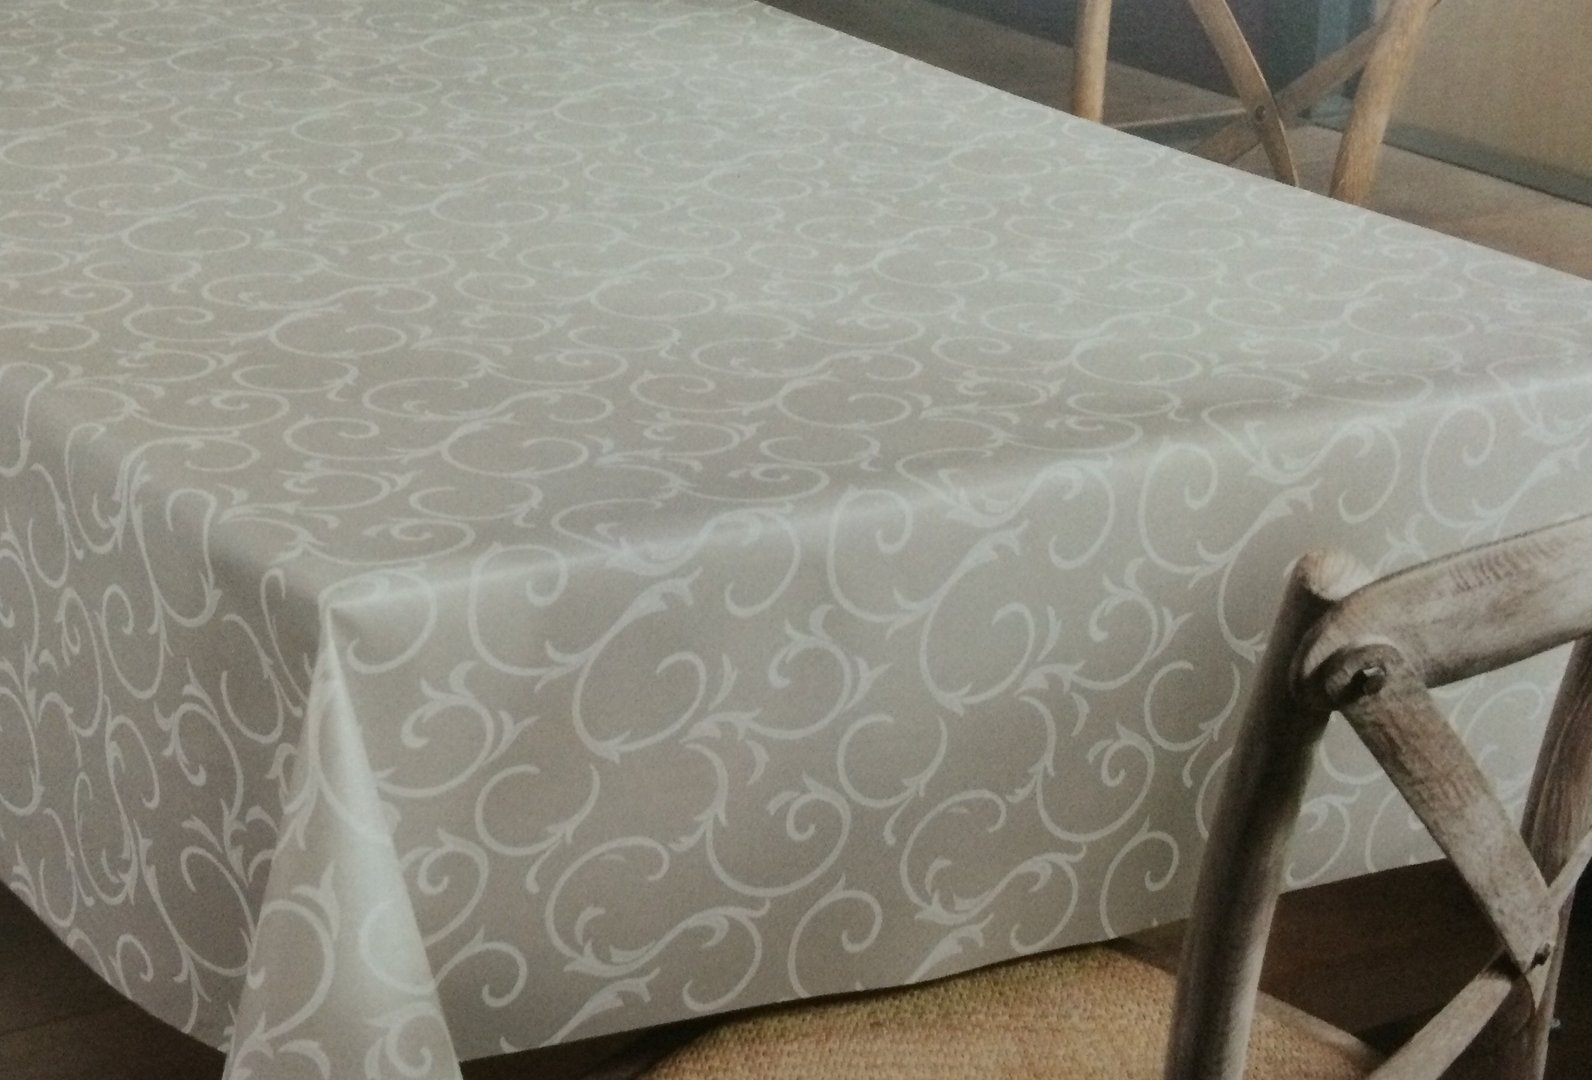 wachstuch rolle 140 cm breite k150193 barock grau floral. Black Bedroom Furniture Sets. Home Design Ideas